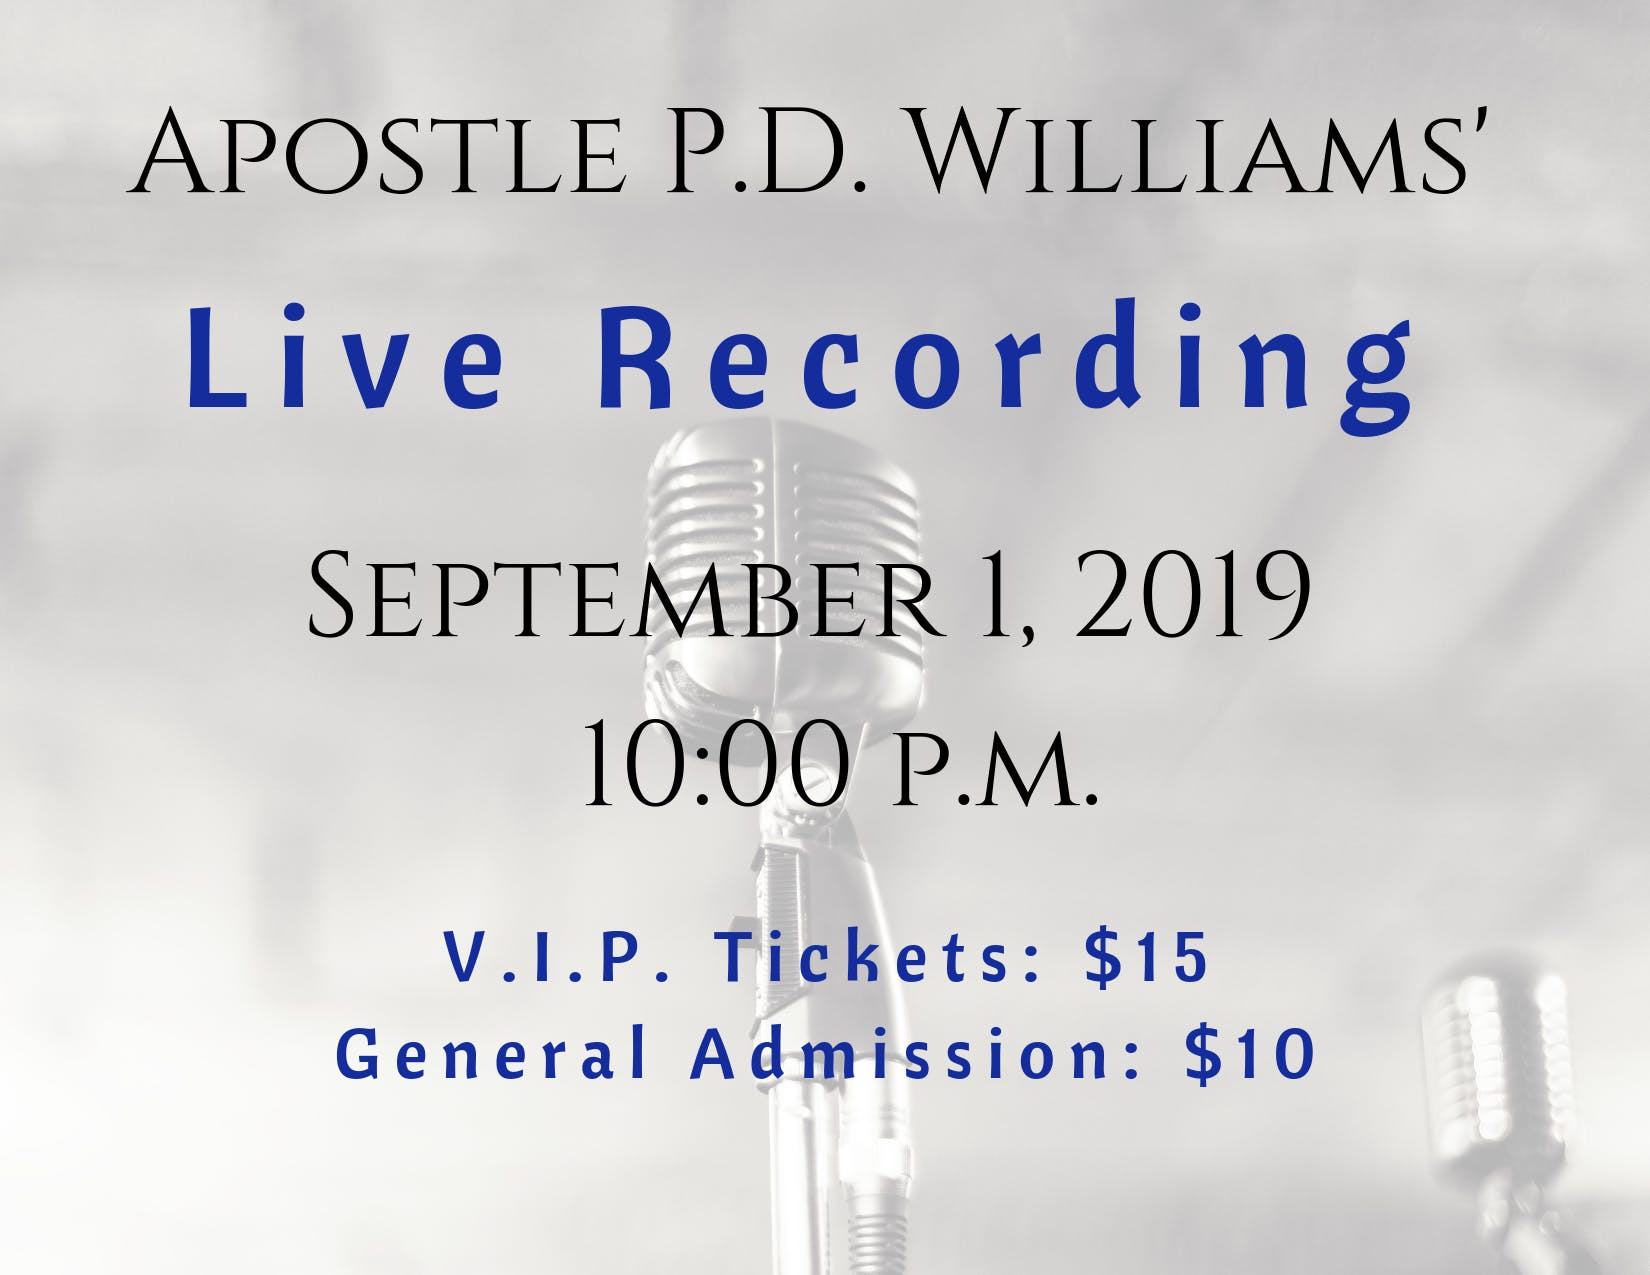 Apostle P.D. Williams' Live Recording